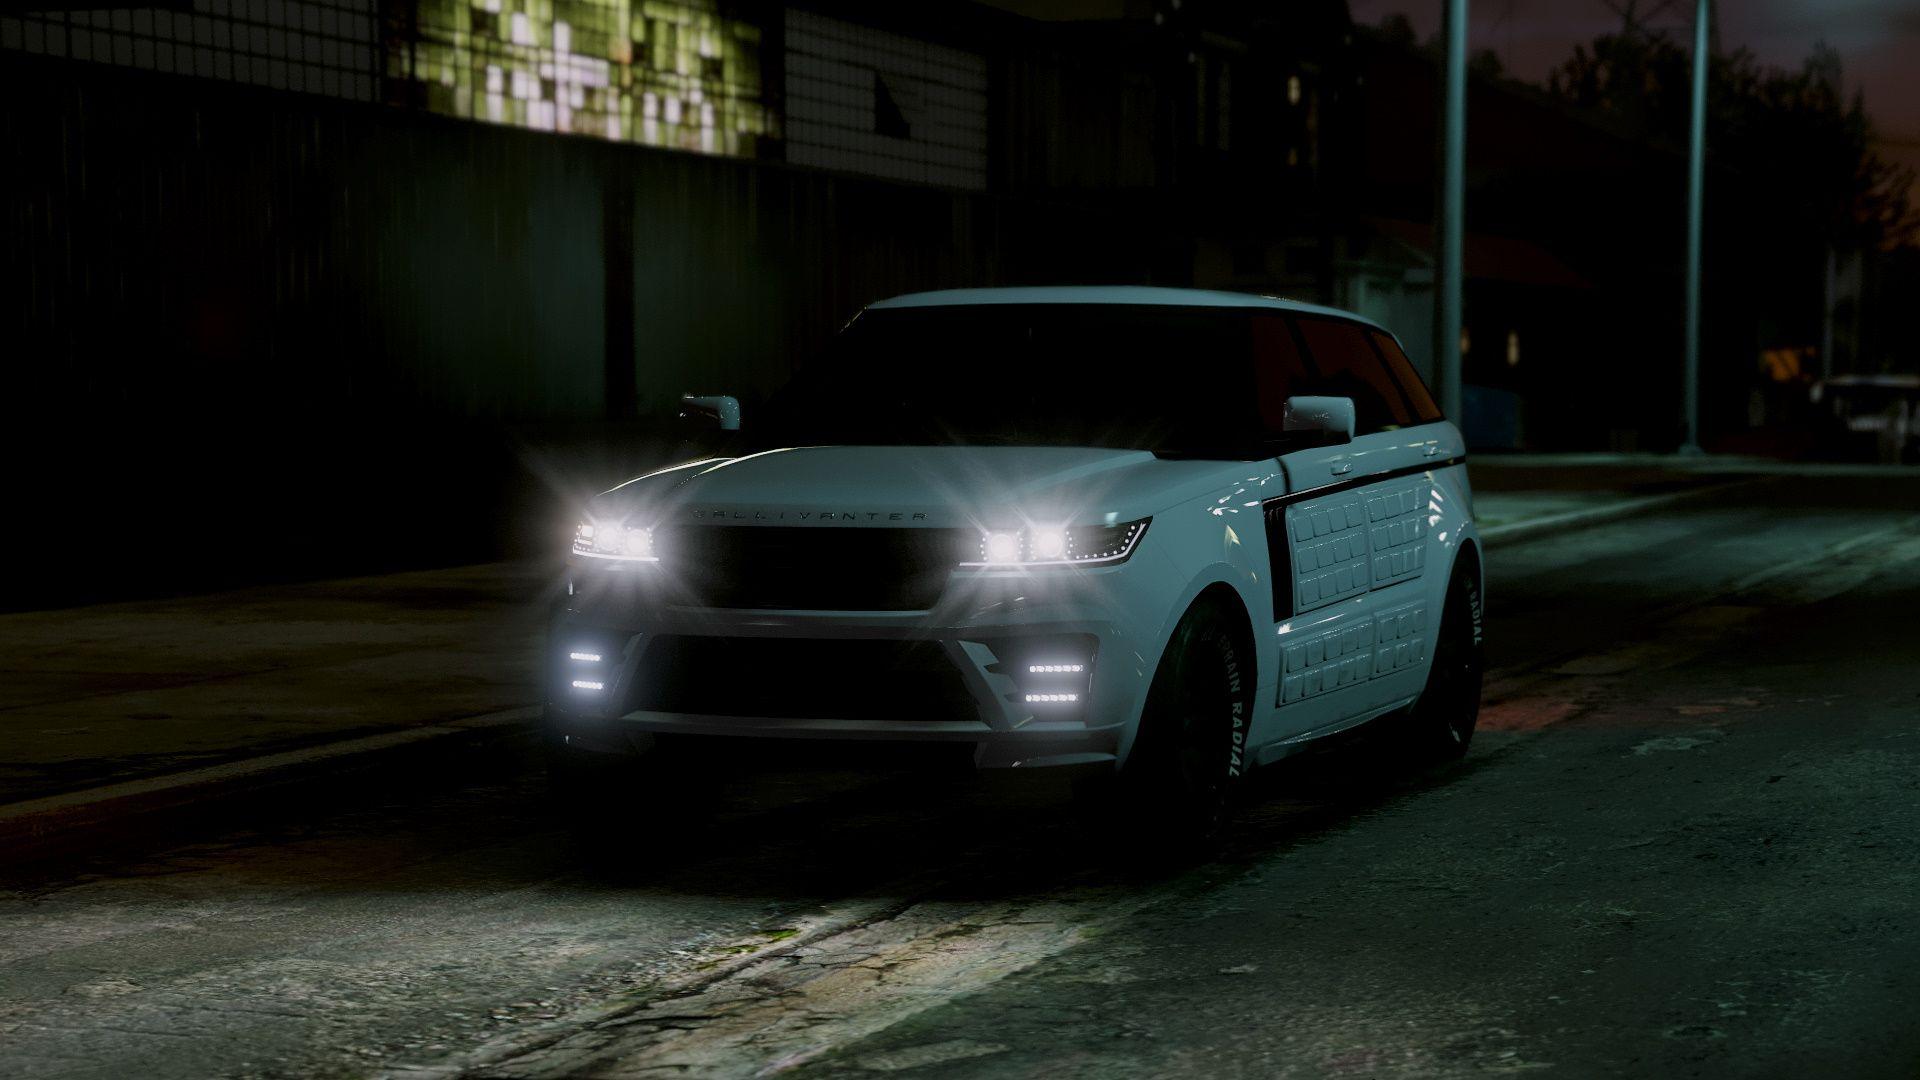 street photoshoot gta v #GrandTheftAutoV #GTAV #GTA5 #GrandTheftAuto #GTA #GTAOnline #GrandTheftAuto5 #PS4 #games